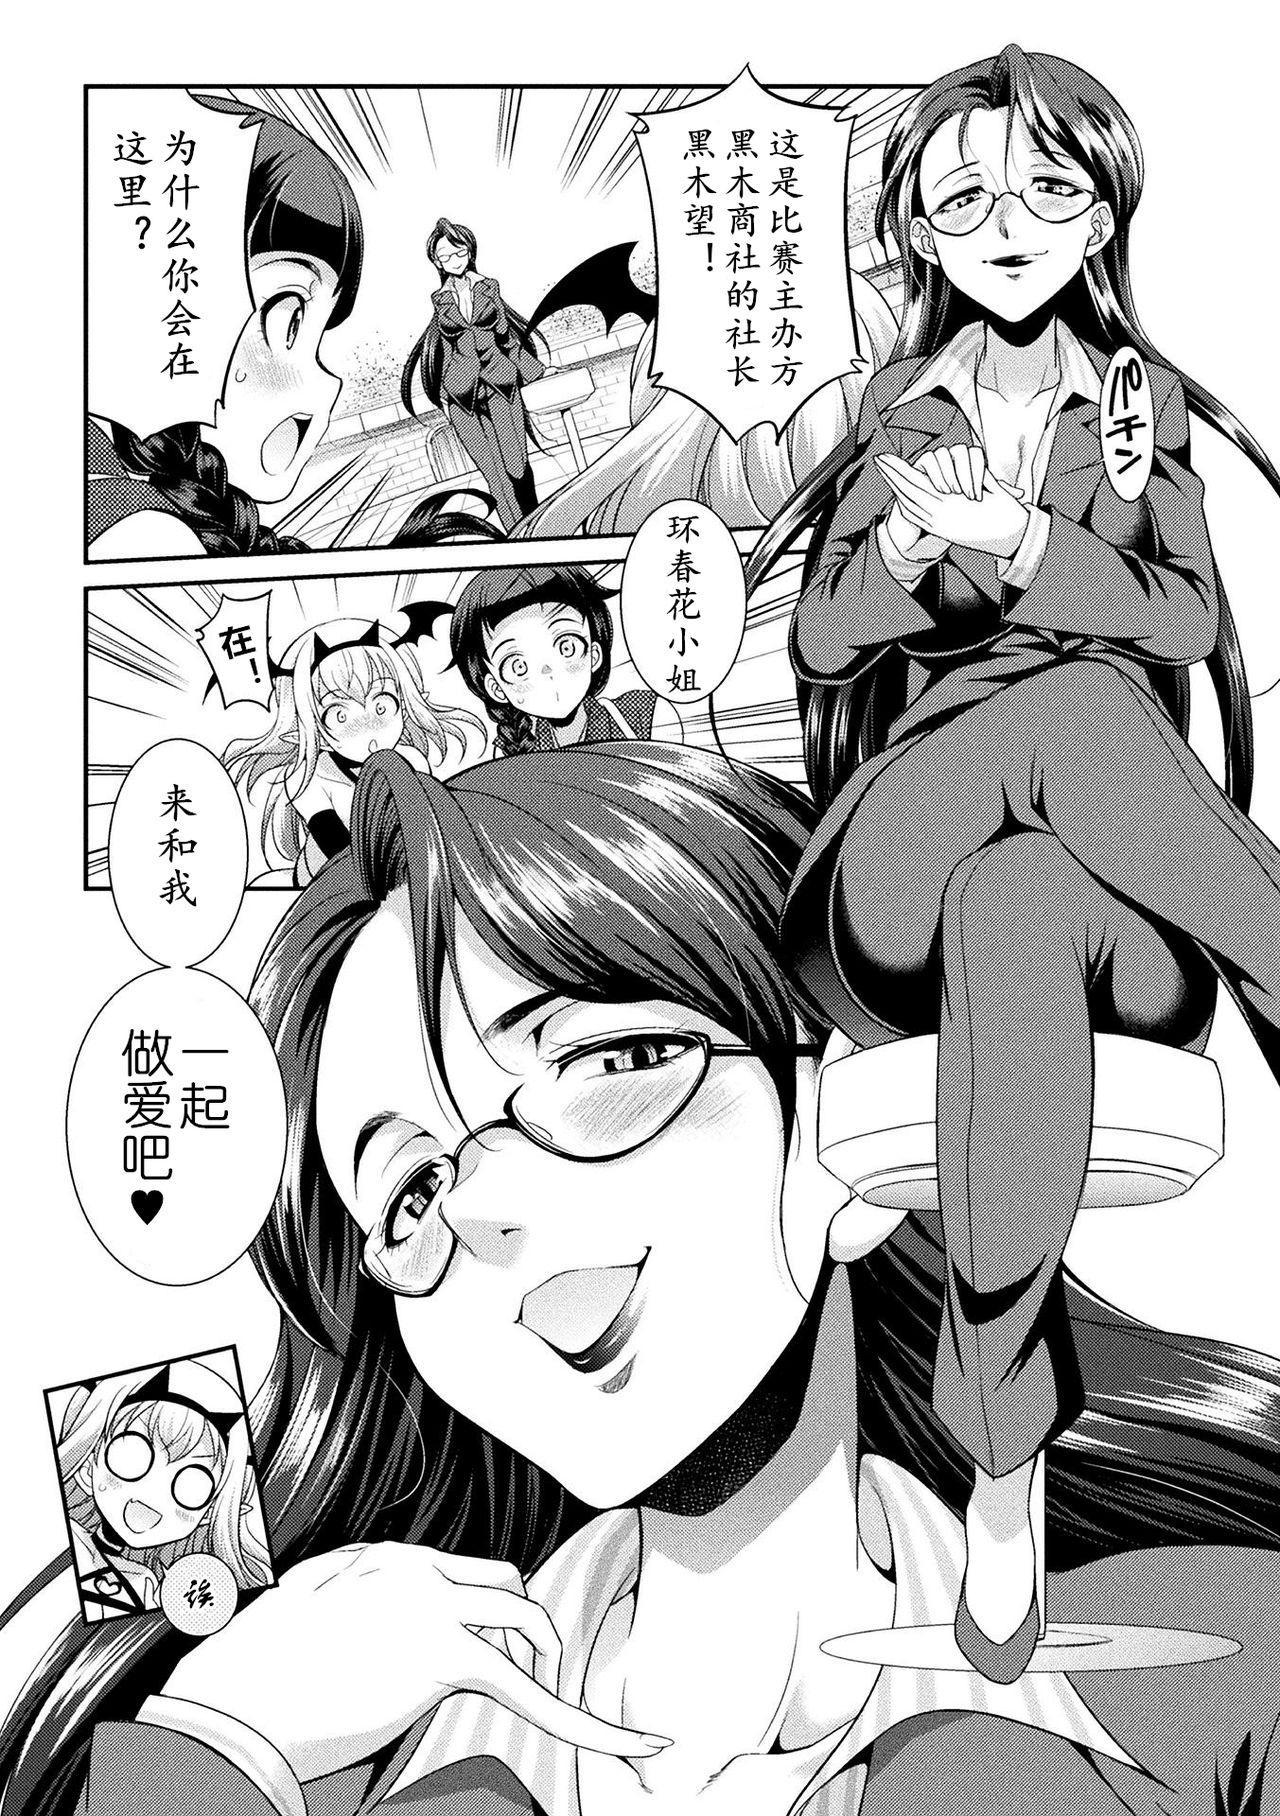 [Kaguya] Futanarijima ~The Queen of Penis~ Ch. 4 [Chinese] [黄记汉化组] 31